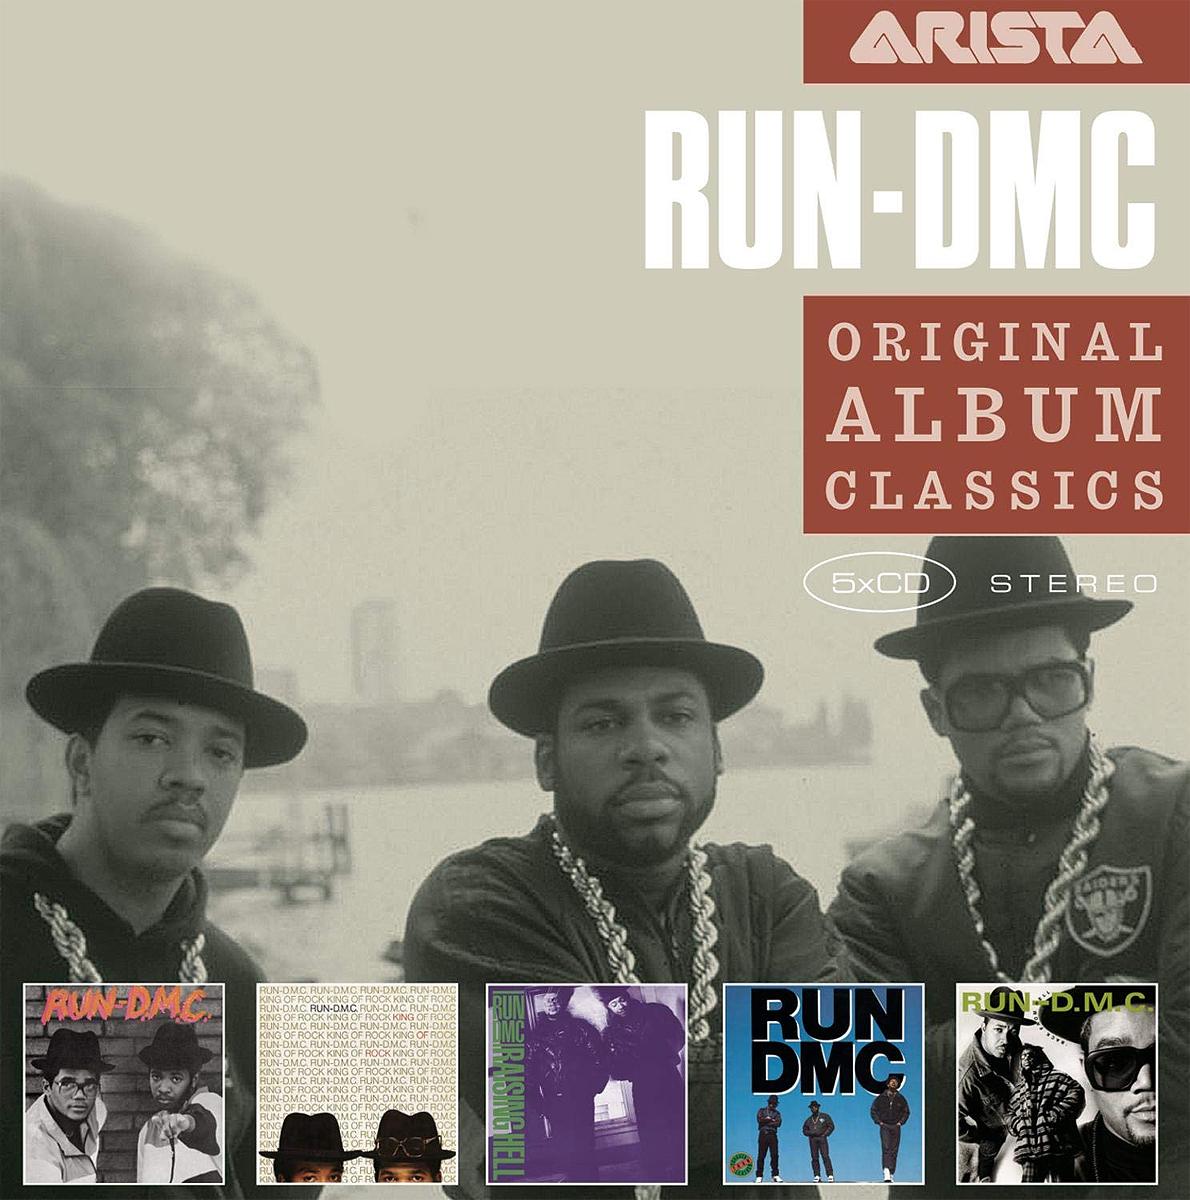 Run-DMC Run-DMC. Original Album Classics (5 CD) binful 6 7 9 9 7 soft tablet case cover for ipad mini 2 3 4 air 1 universal liner sleeve tablets zipper pouch bag